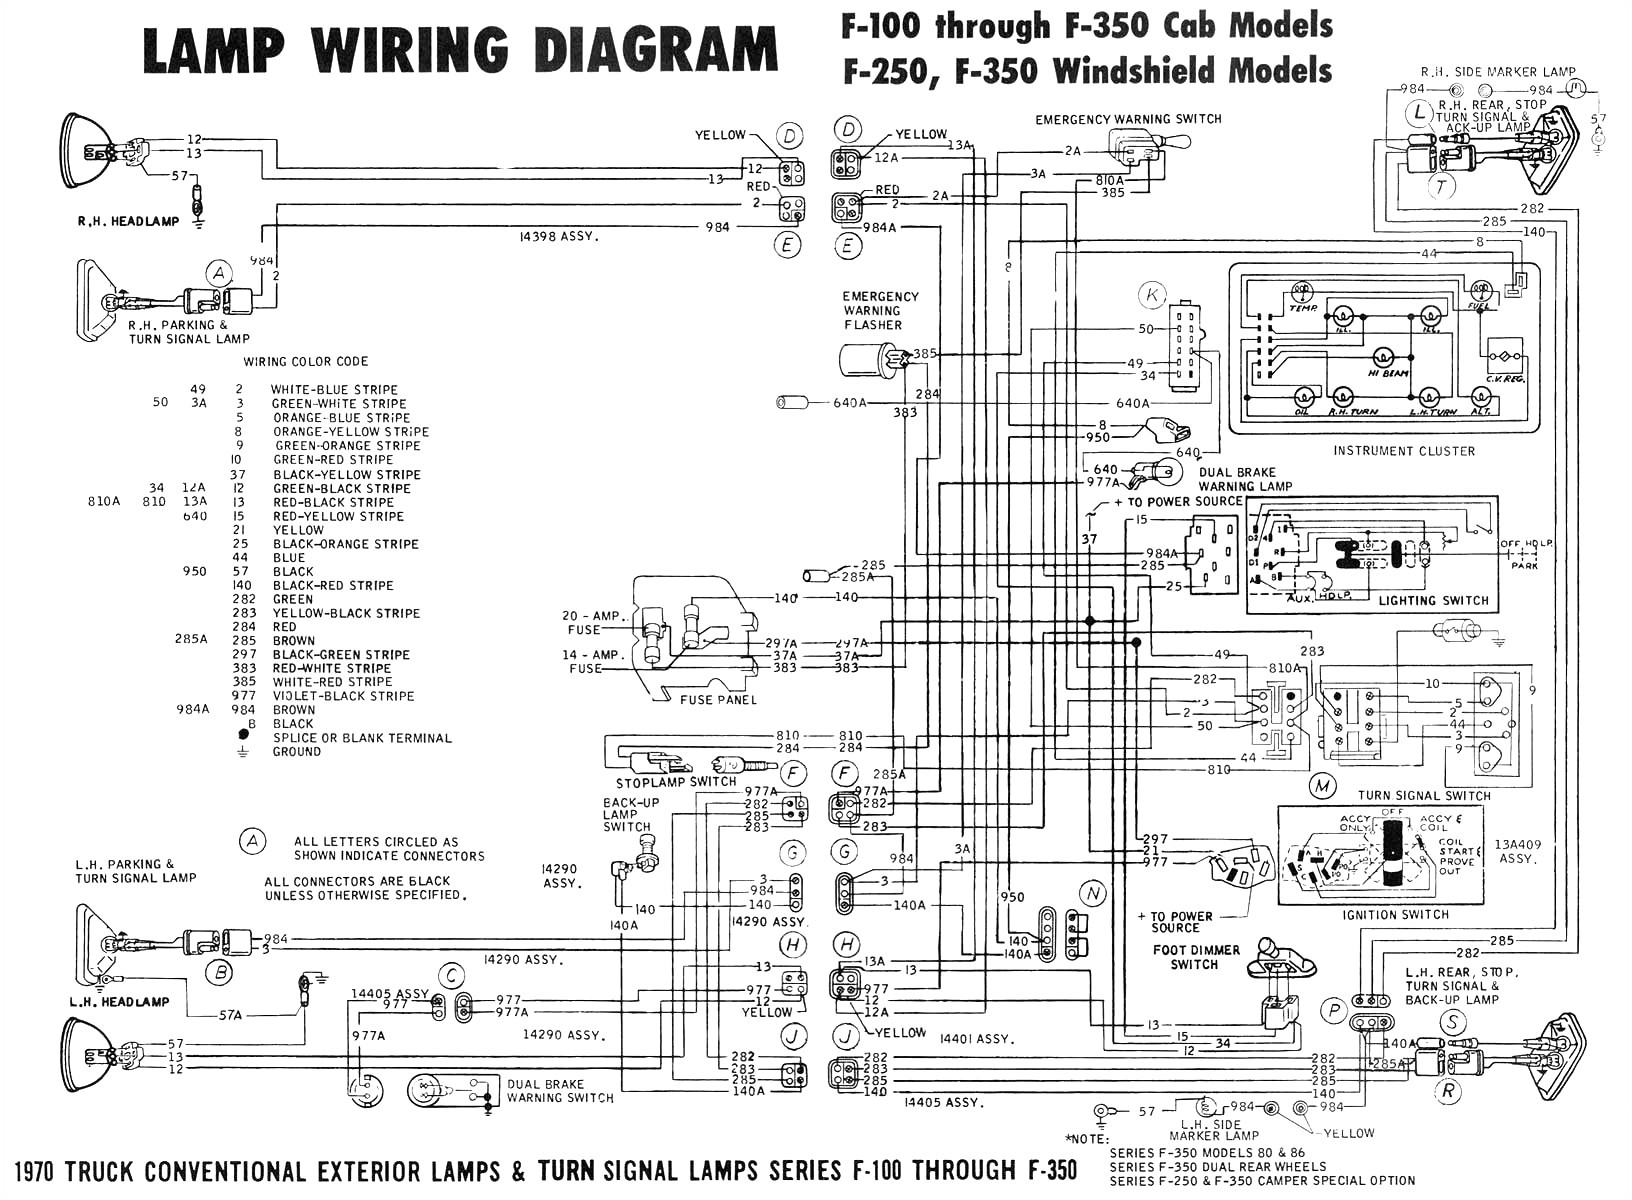 1999 f250 snow plow wiring diagram